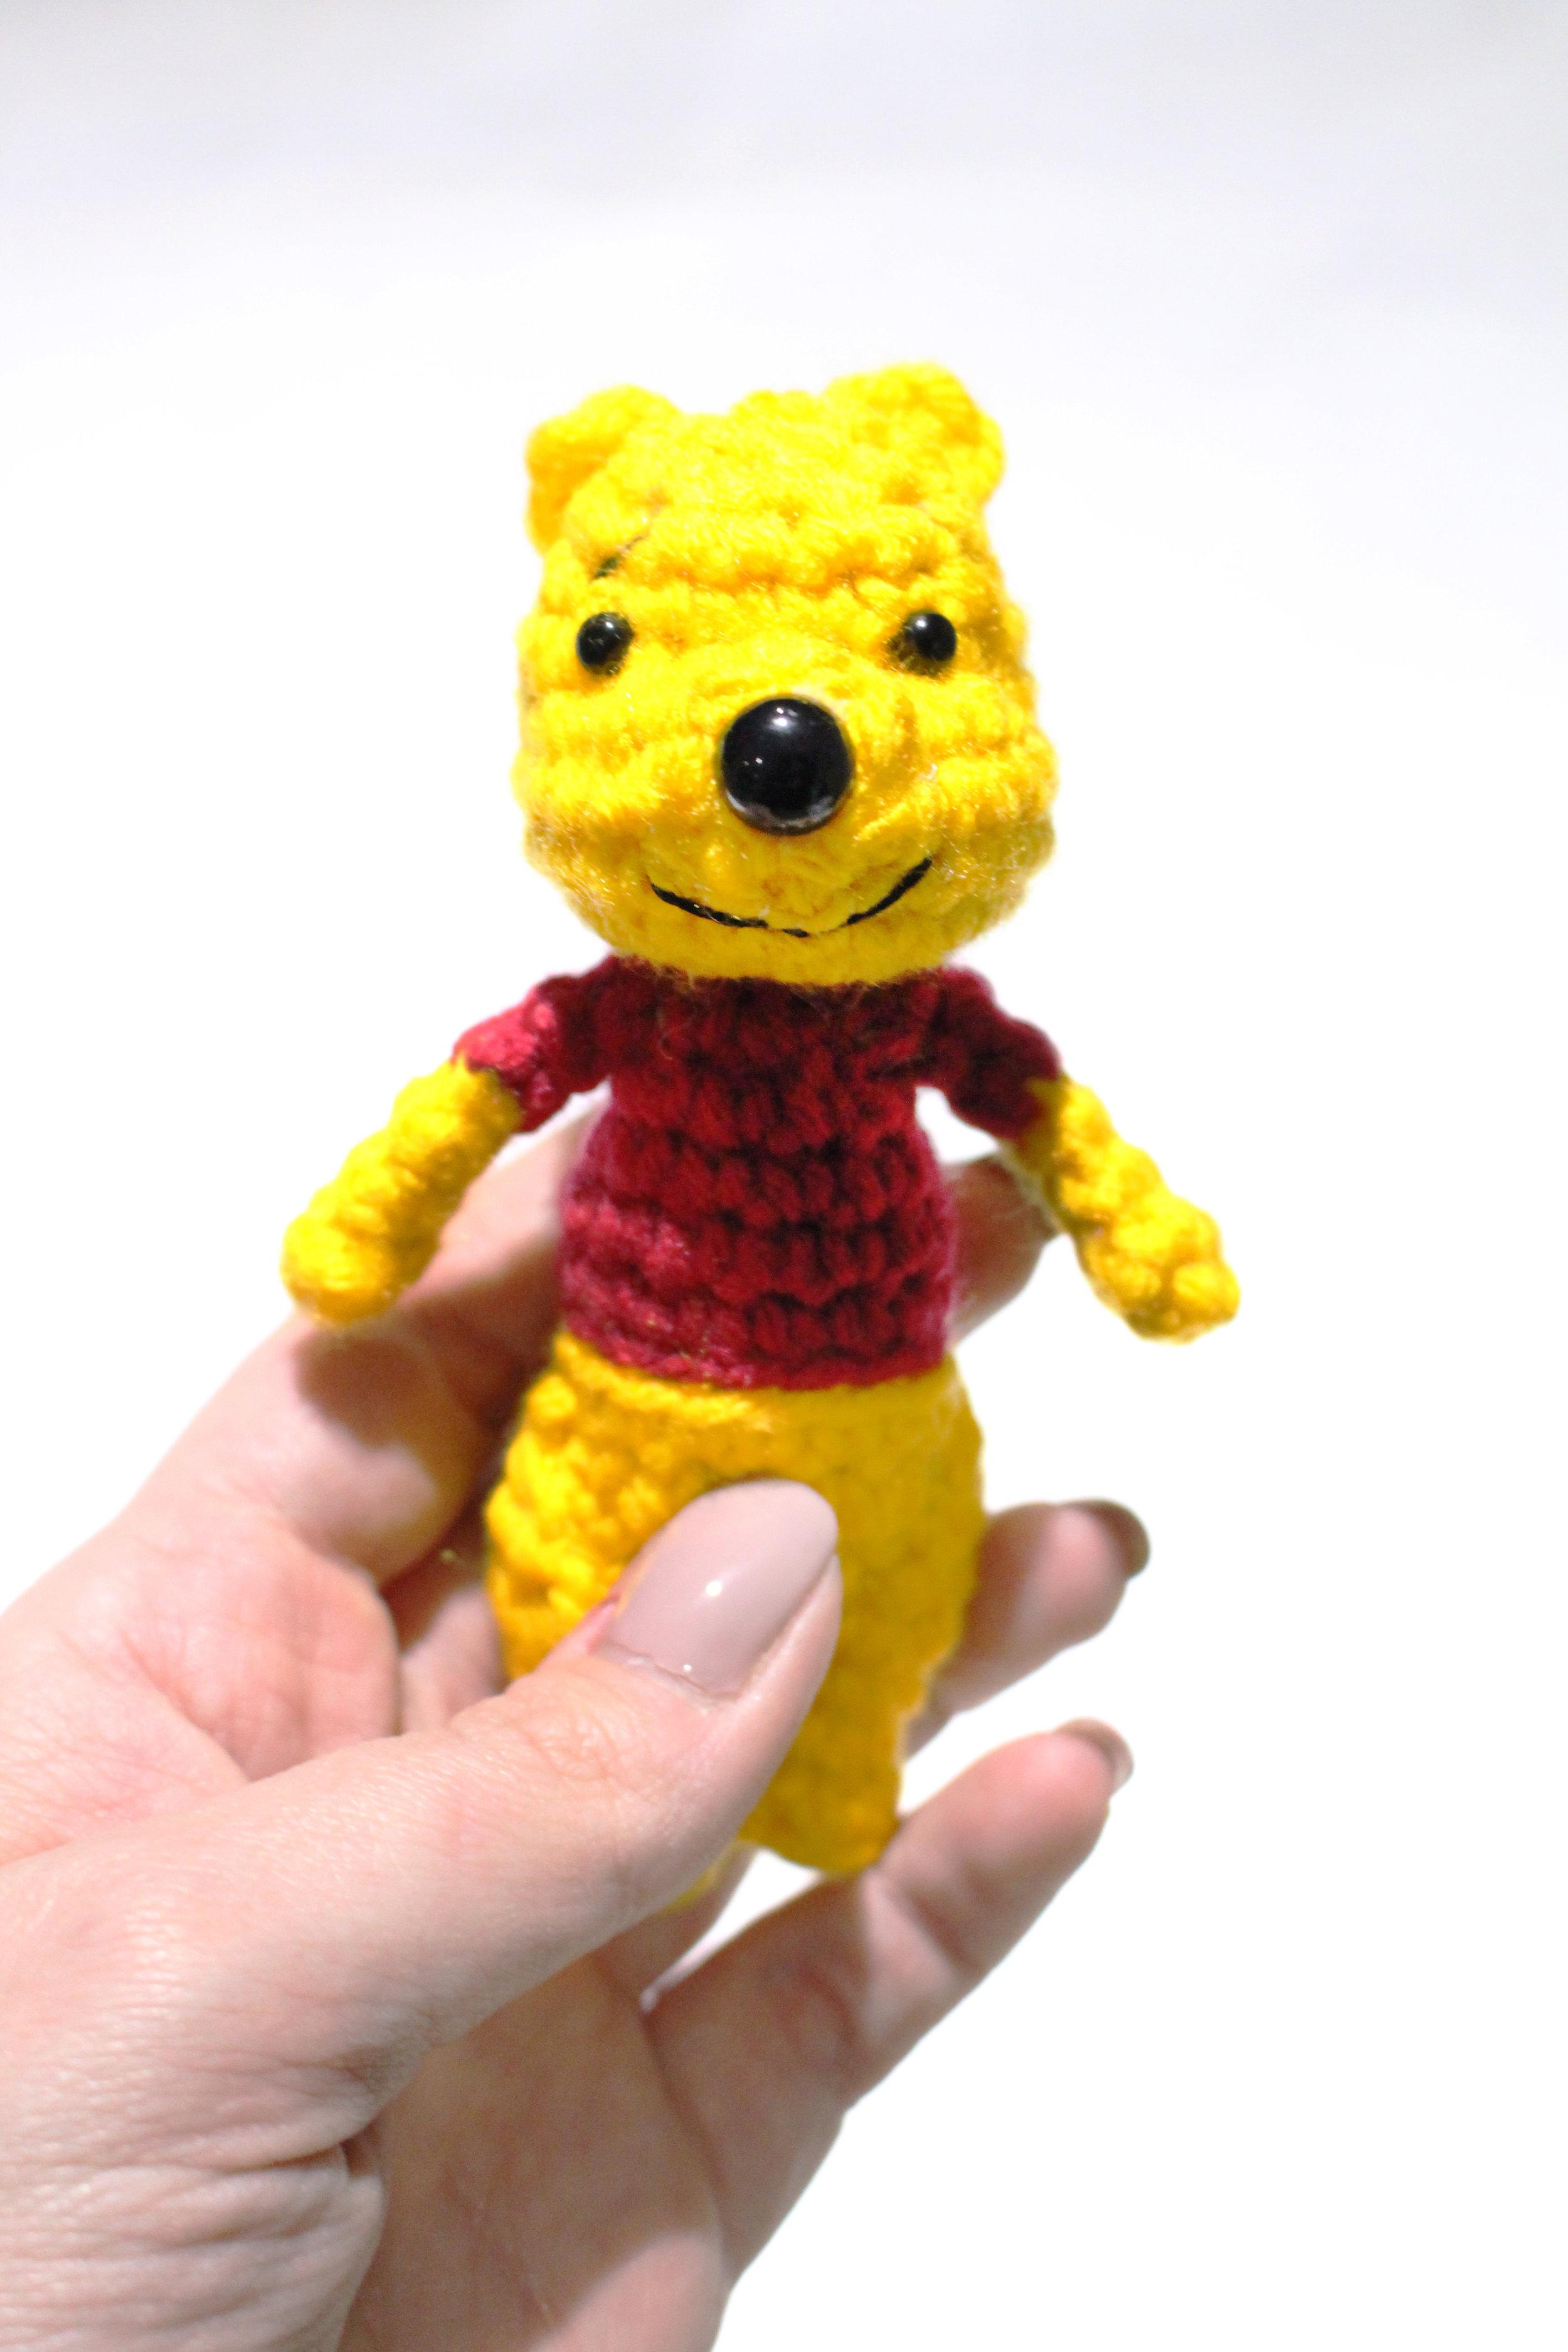 Meet Mini Pooh - The Revised Edition